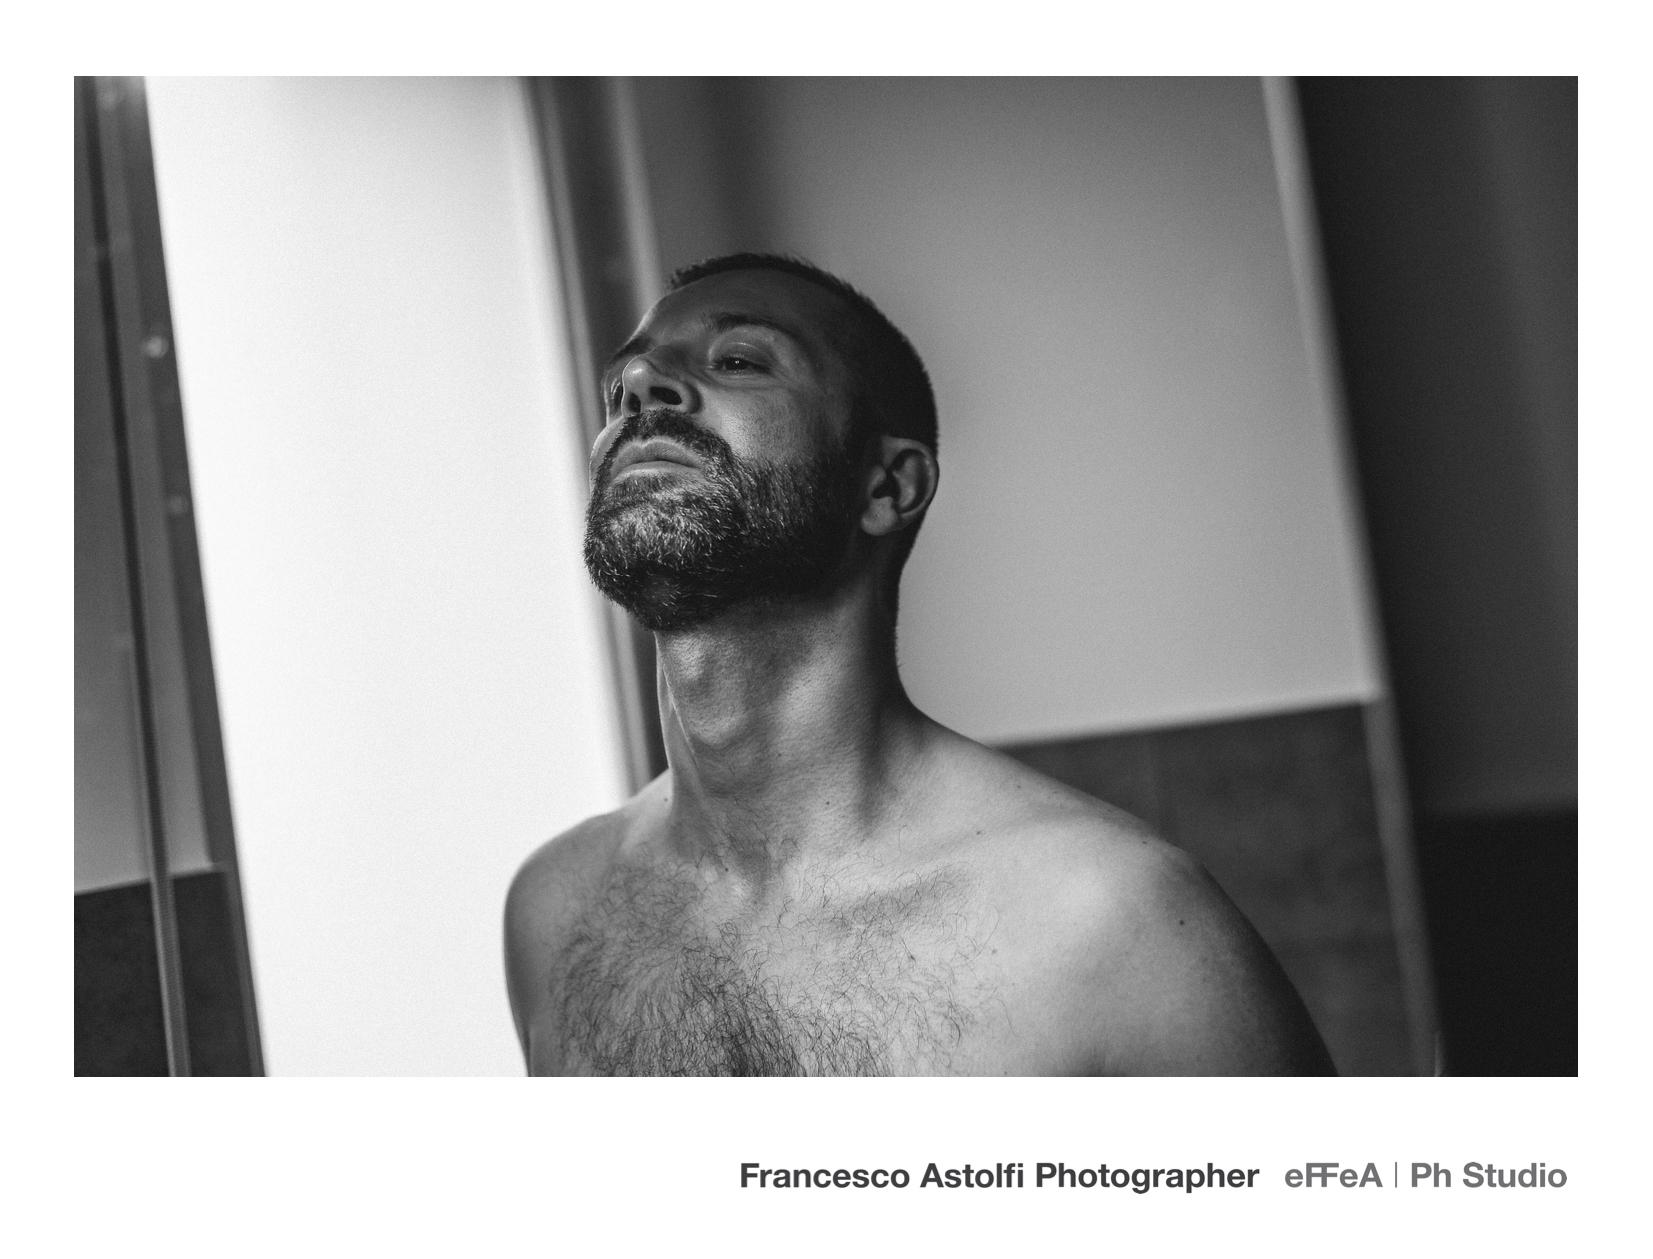 013 - ANDREA S. - Photo by Francesco Astolfi